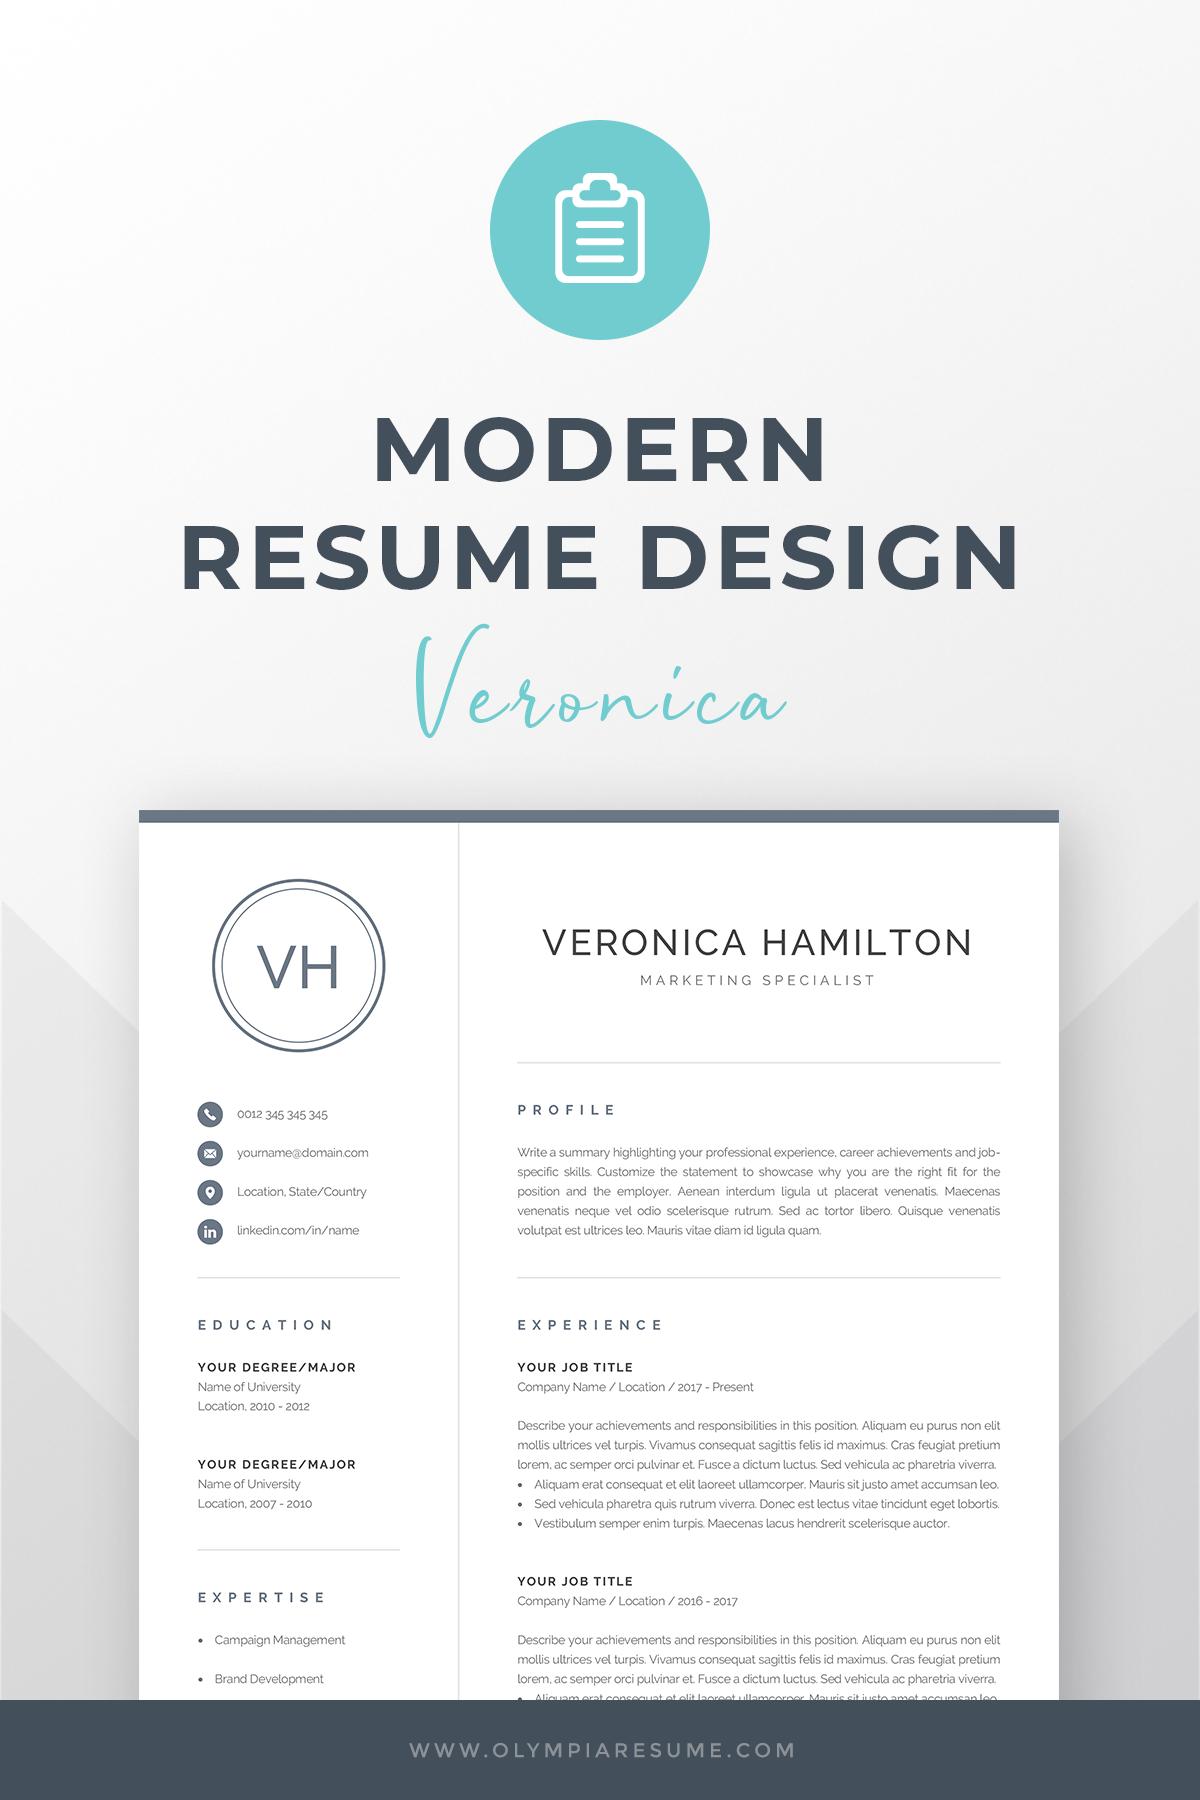 Clean Professional Resume Template For Ms Word Modern Resume Design Cv Template Design Instant Digital Download 1 Page Beauty Salon Logo Salon Logo Cover Letter Design